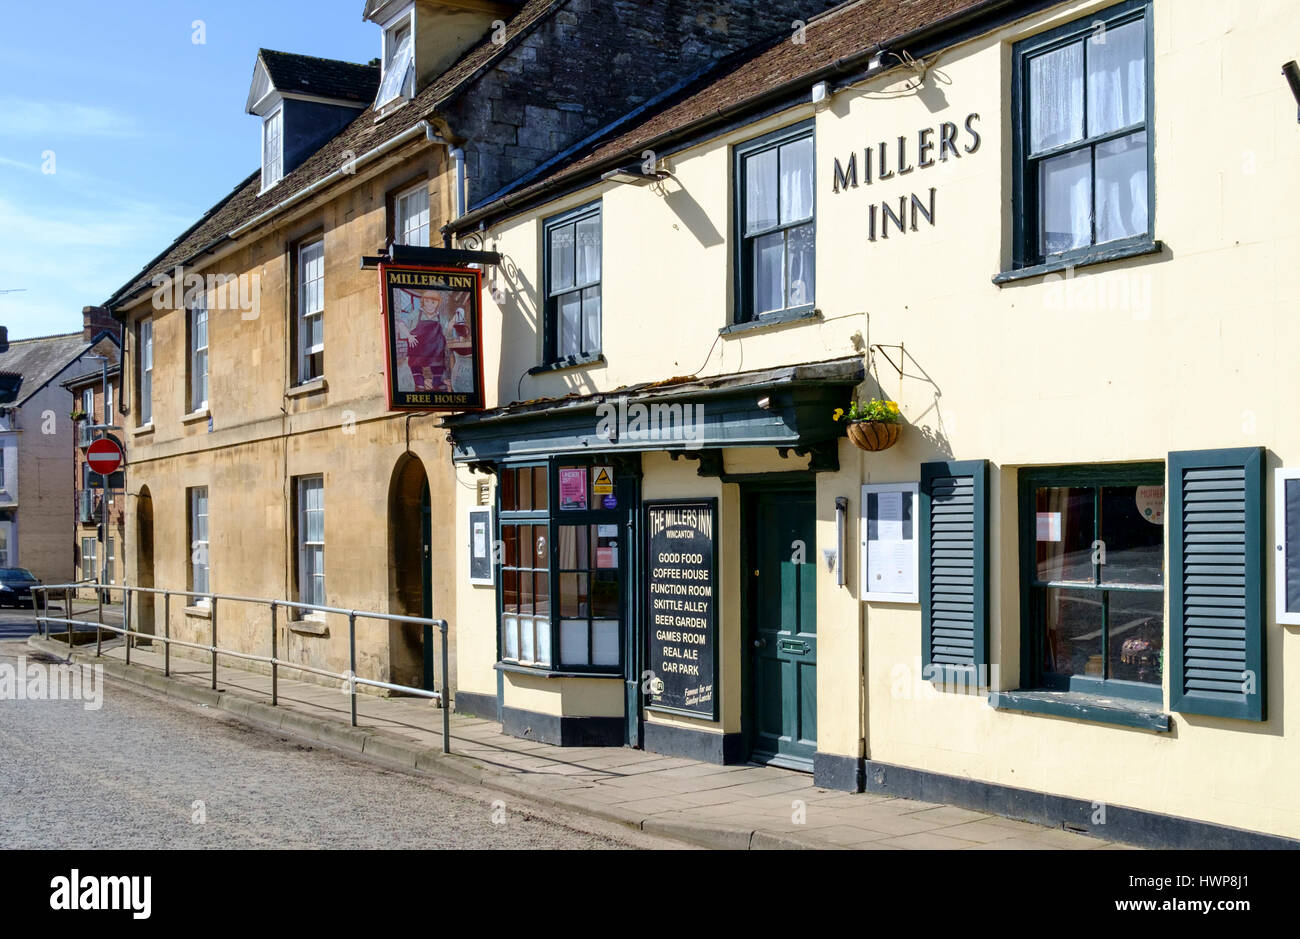 Views of Wincanton Town in somerset England UK. Millers Inn - Stock Image